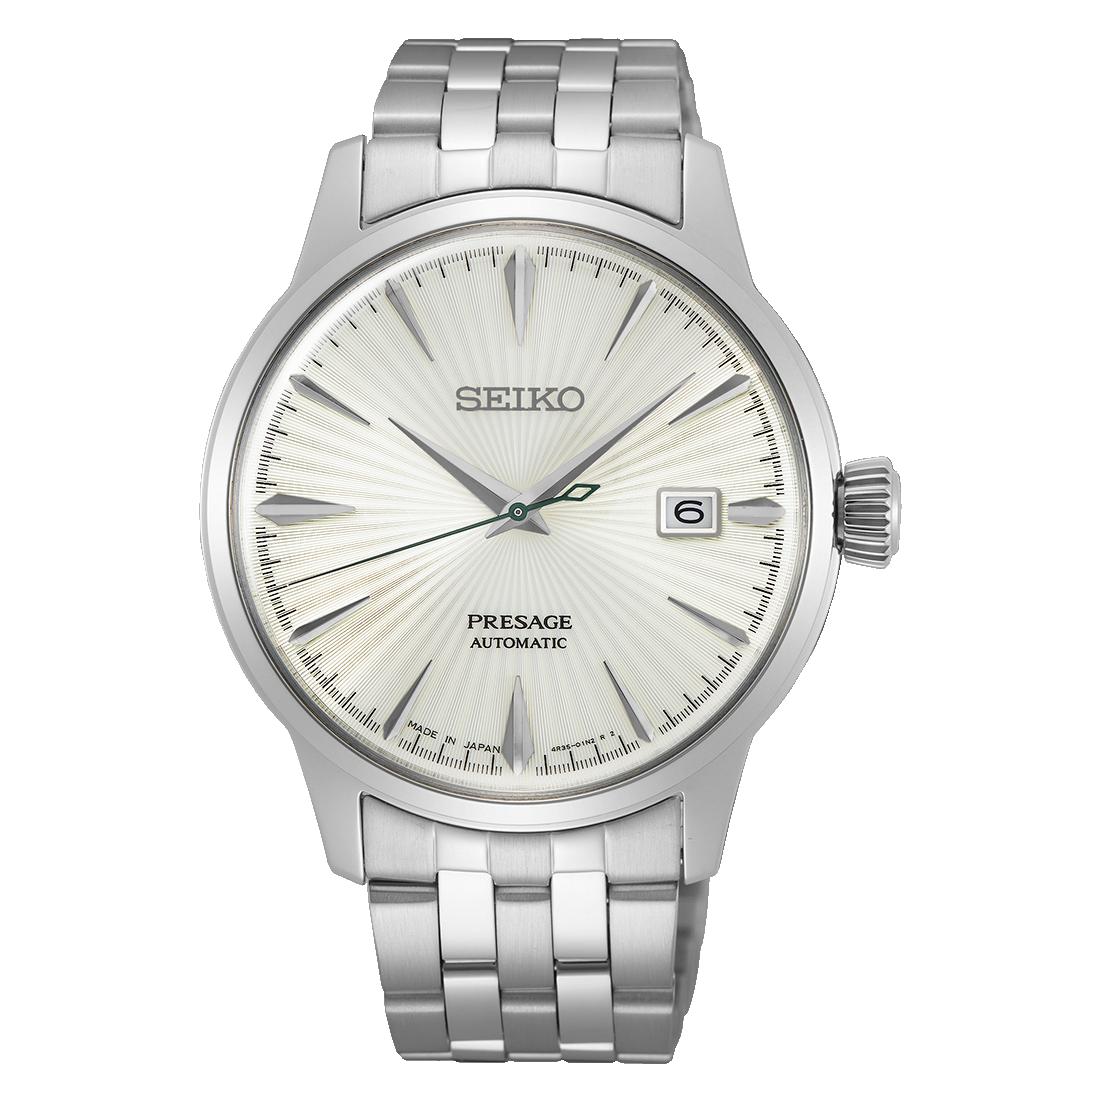 Orologio Seiko Presage SRPG23 J1